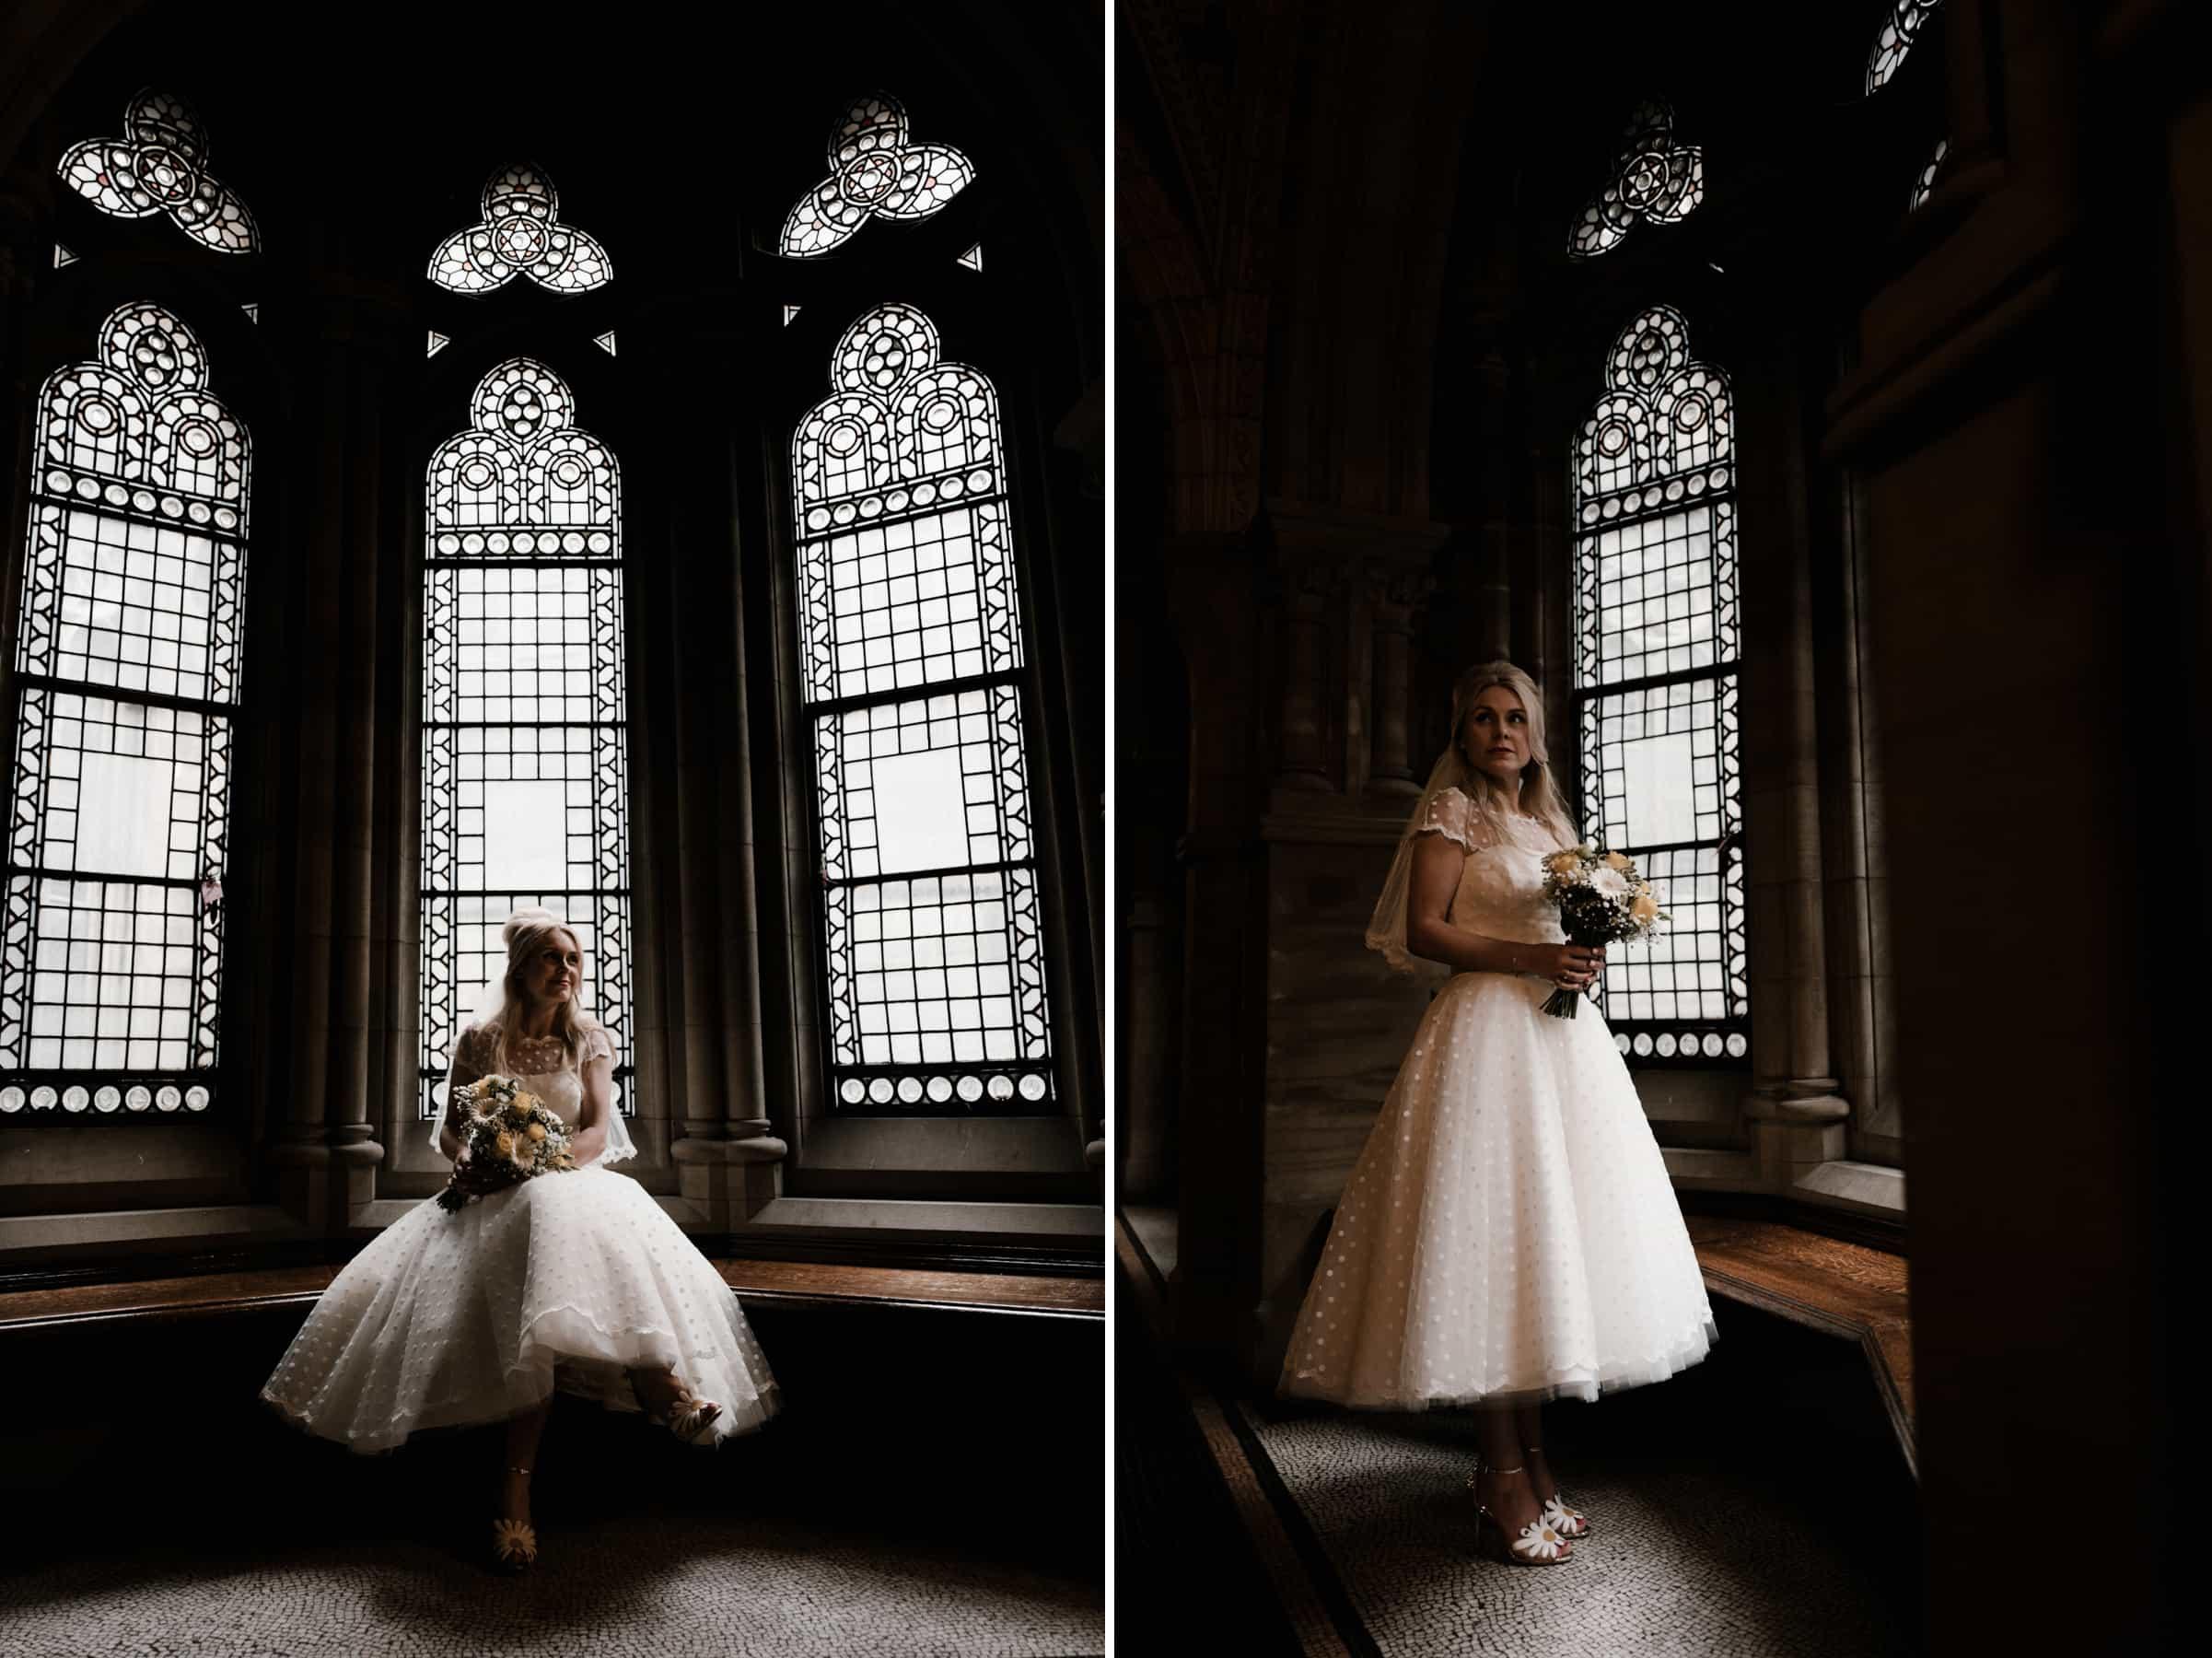 Bride portrait next to a window